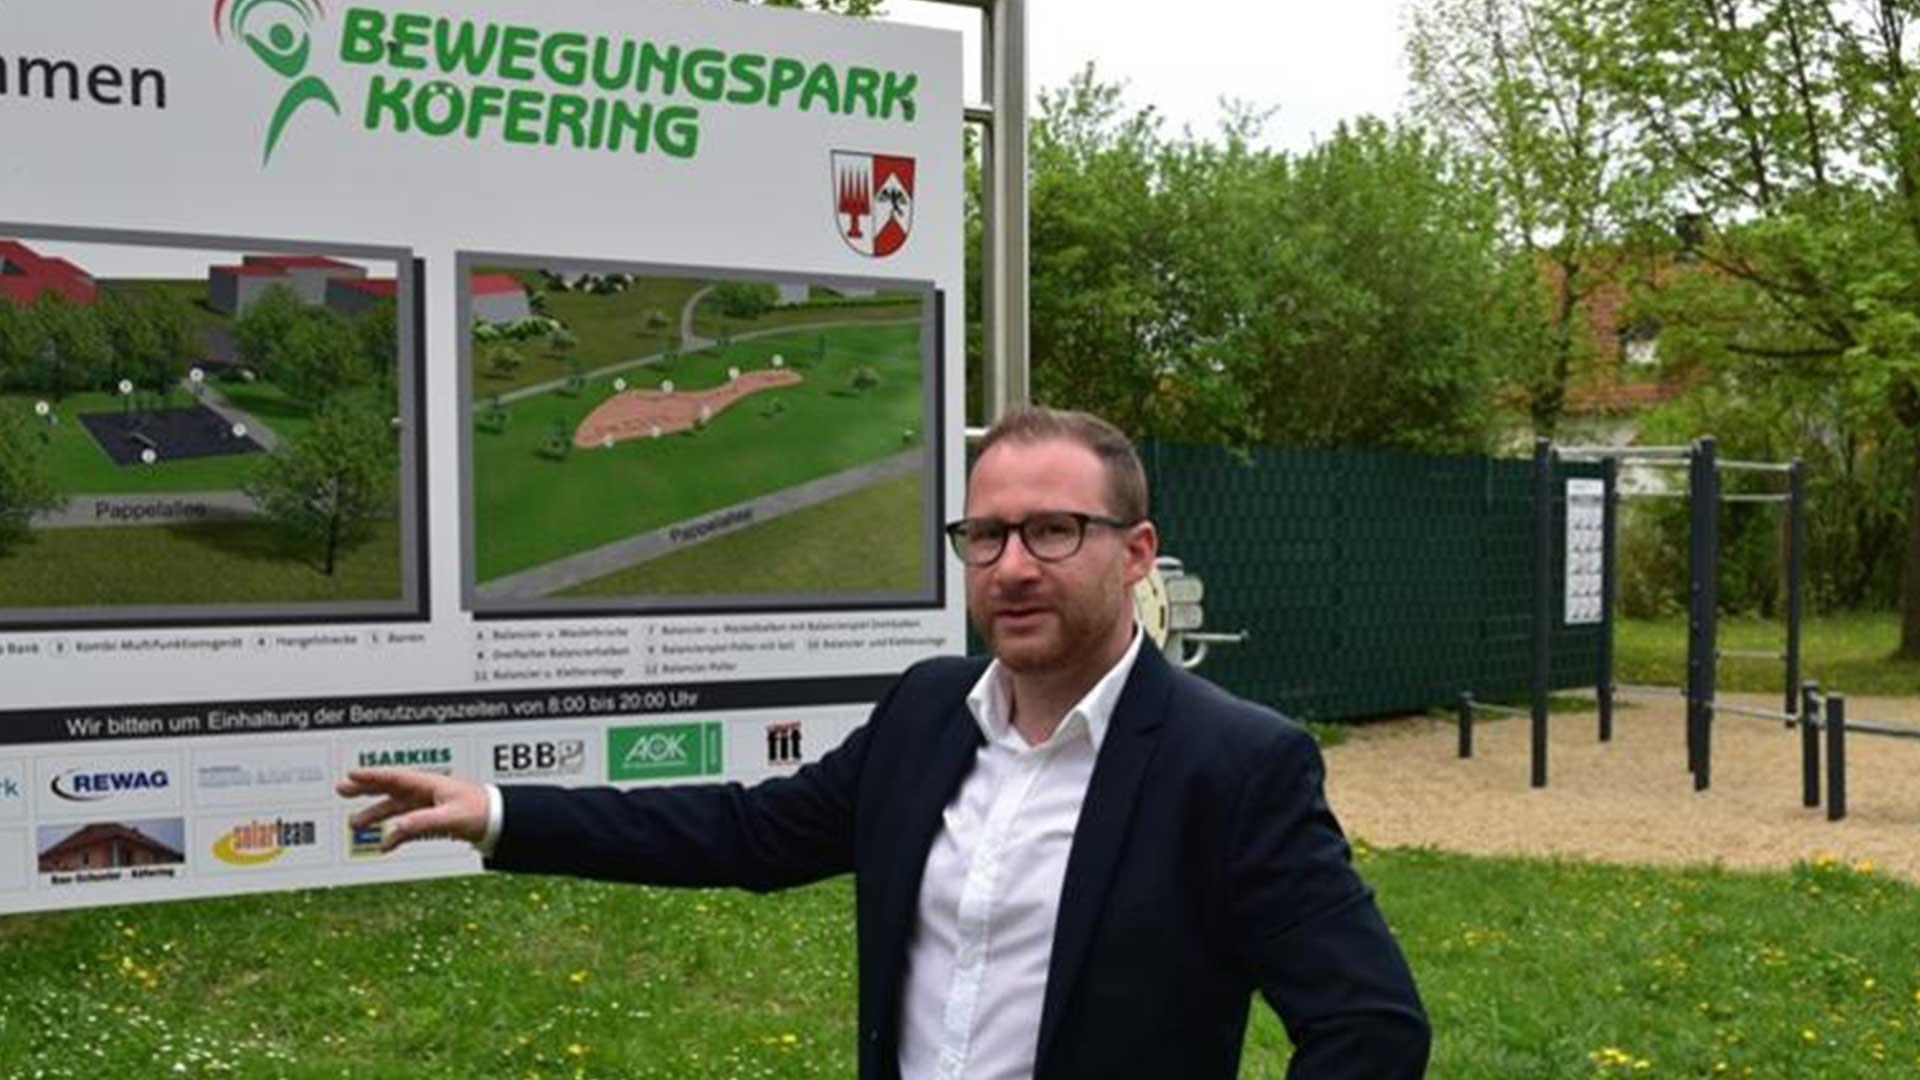 Manuel Hagen am Bewegungspark